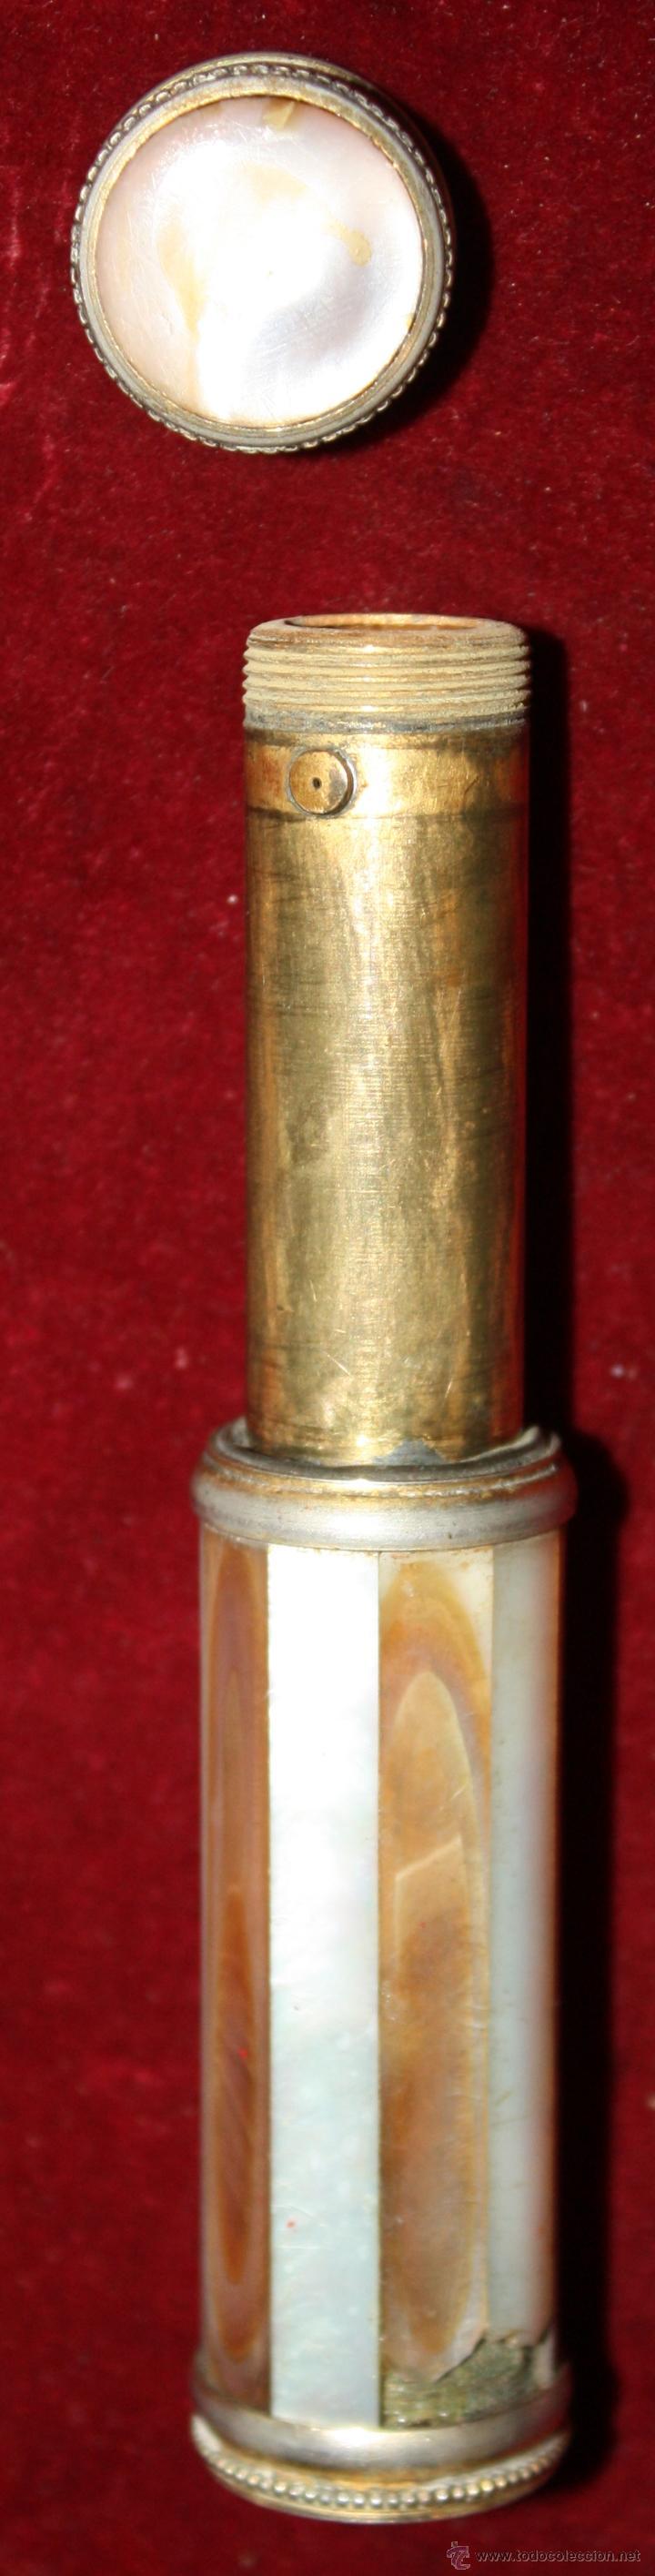 Antigüedades: PERFUMERO ATOMIZER MARCEL FRANCK EN NACAR. CIRCA 1920 - Foto 4 - 45639917